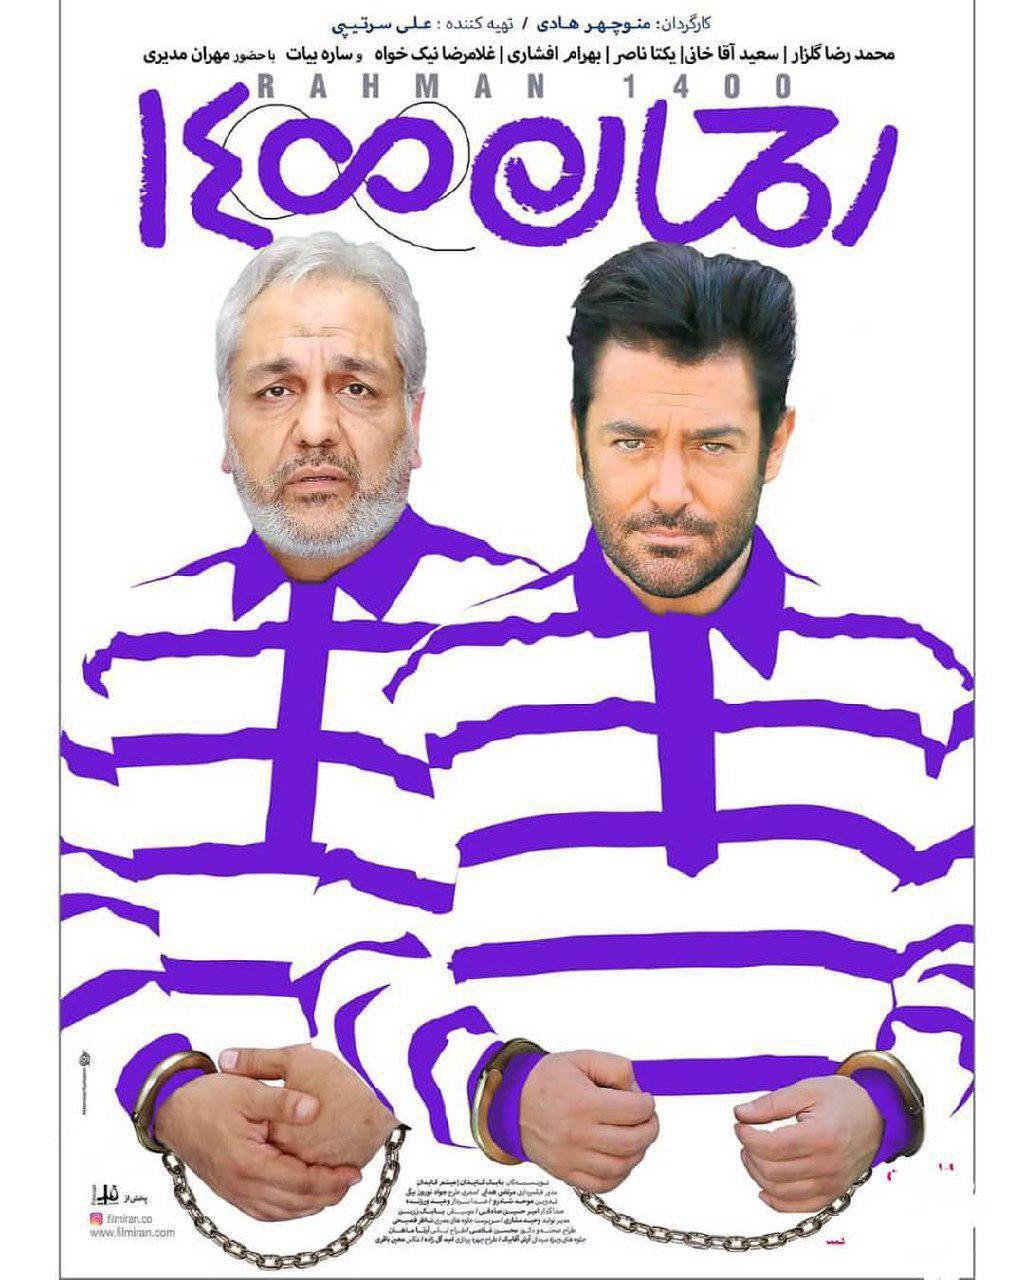 Mohammad Reza Golzar and Mehran Modiri in Rahman 1400 (2019)